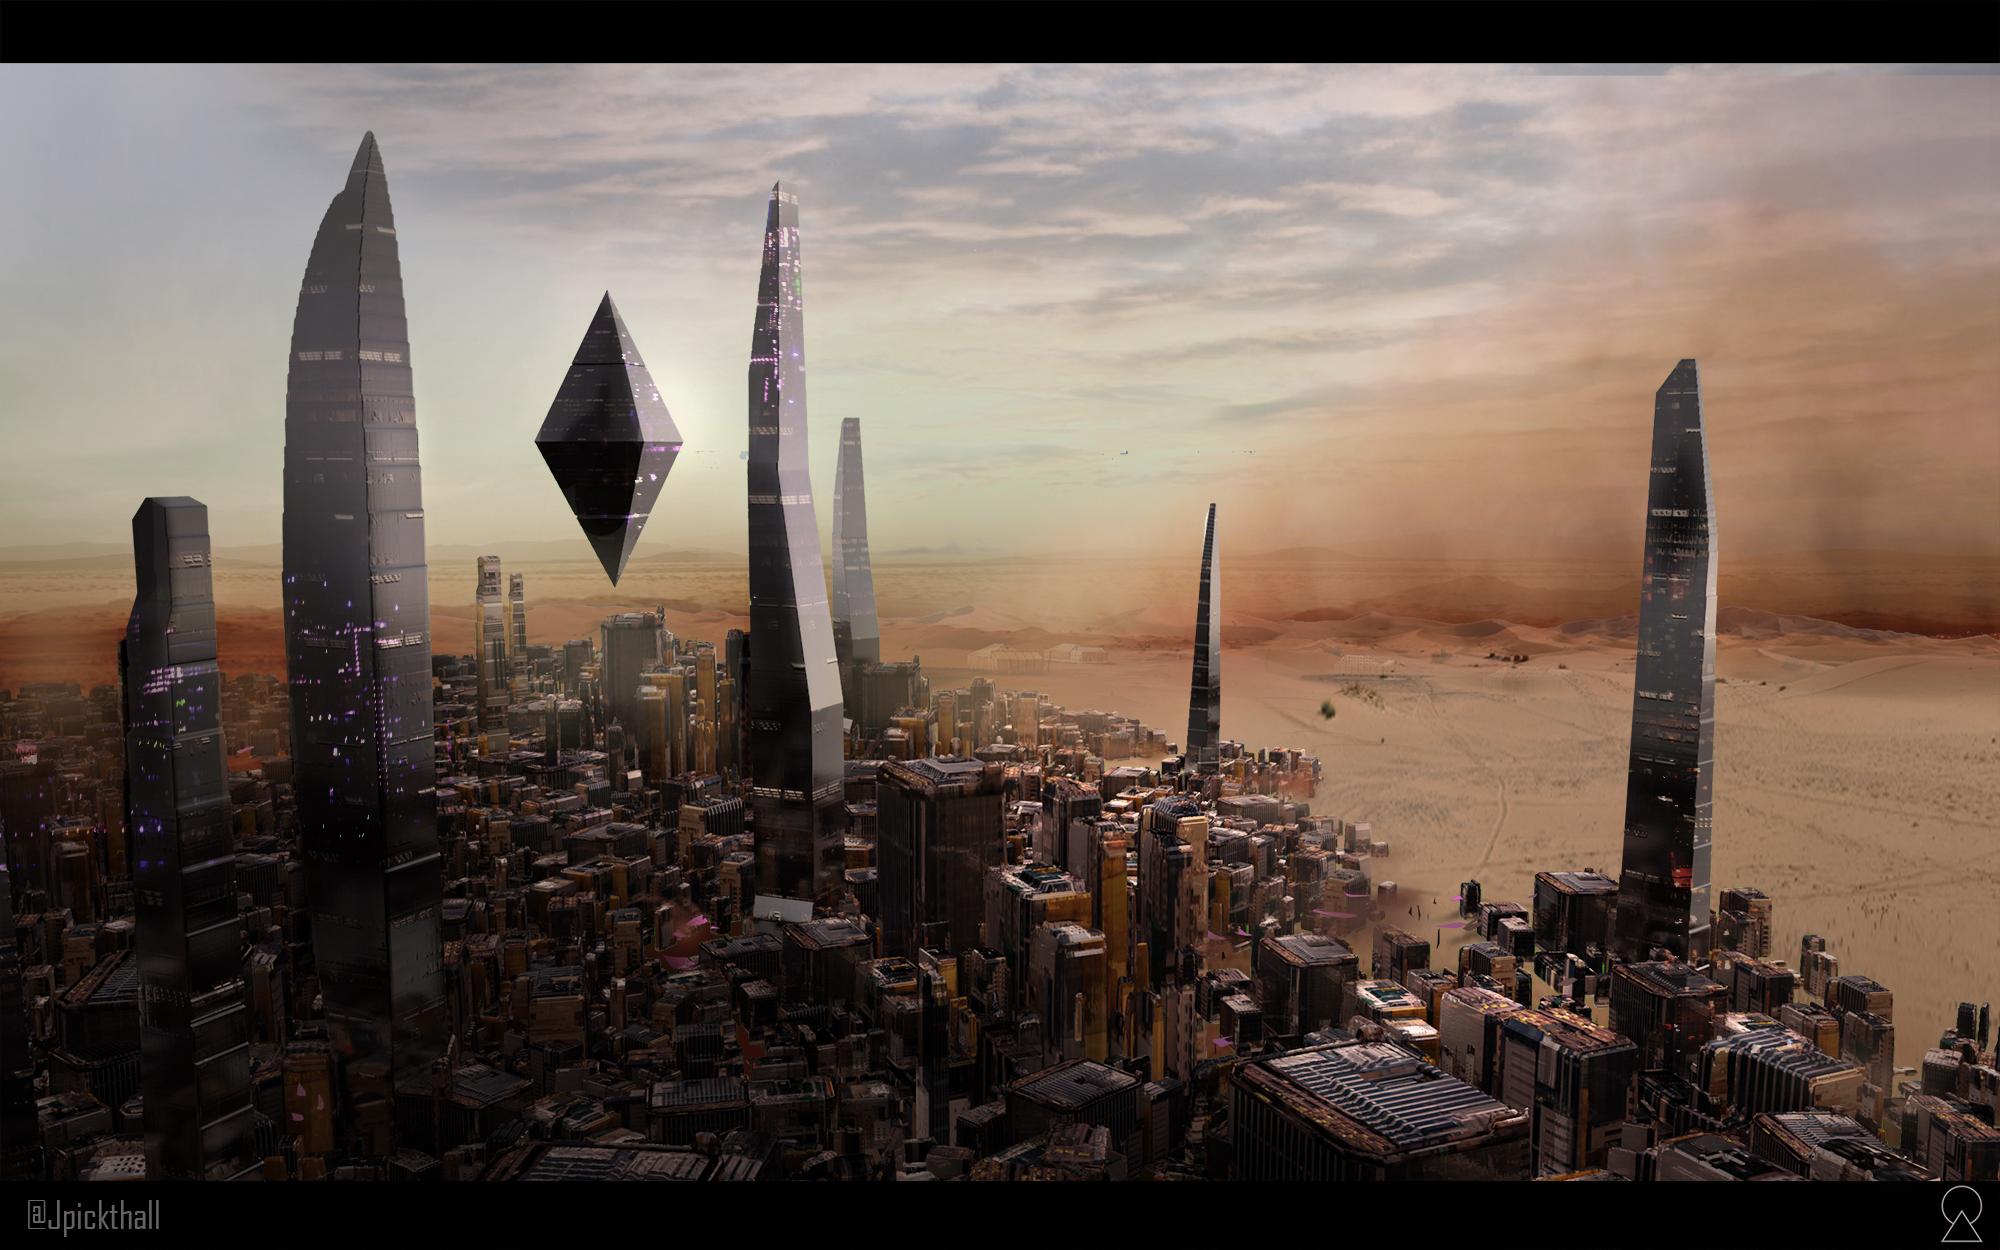 Ra_City_Concept_02_small